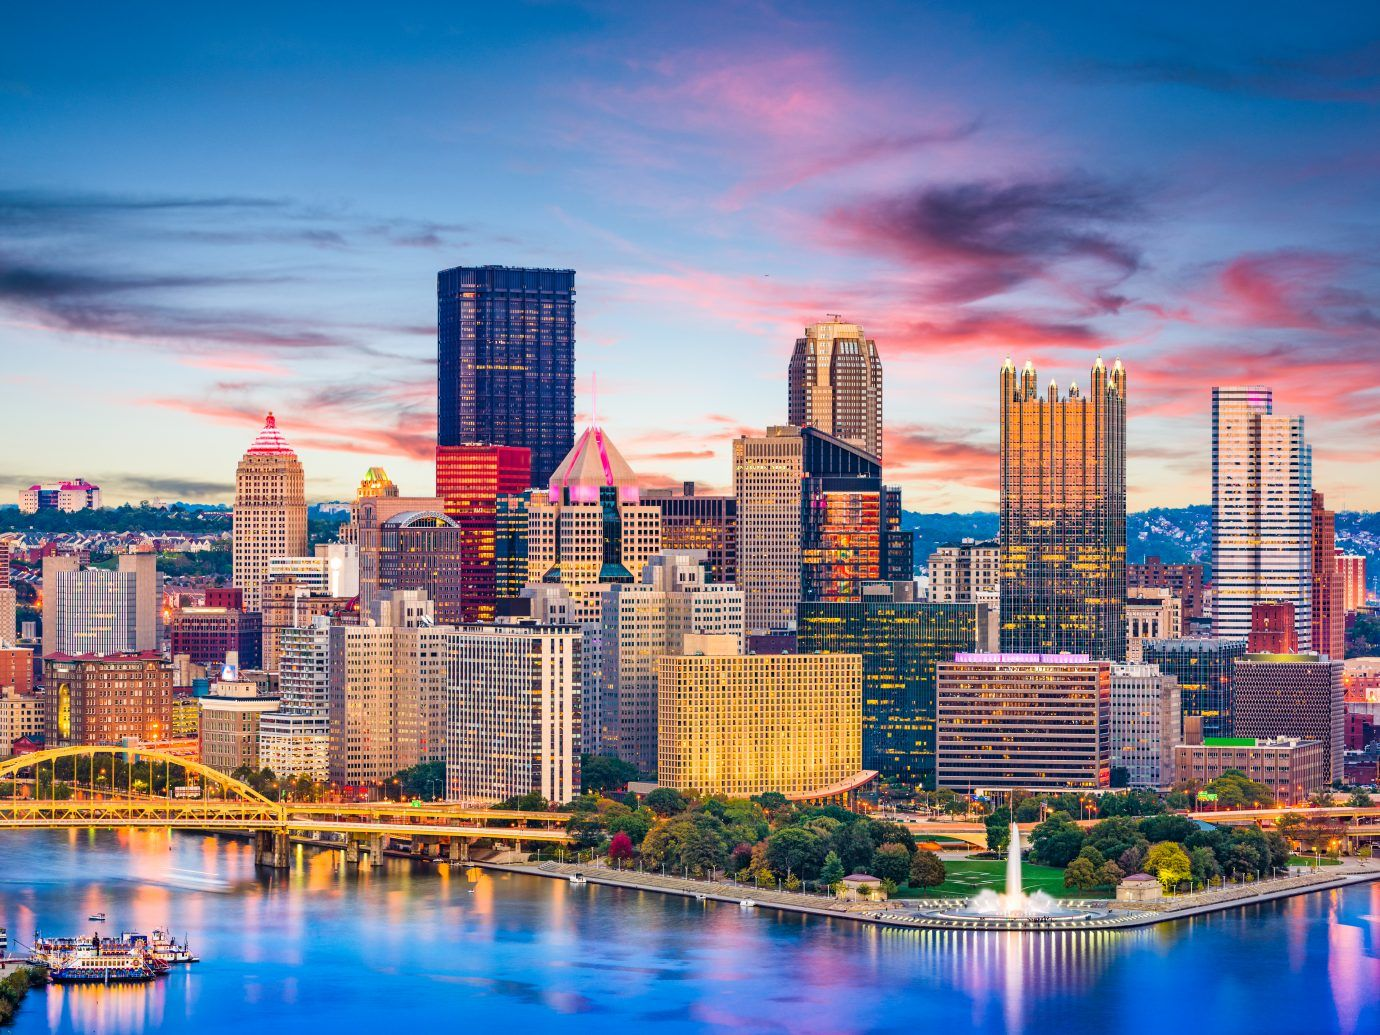 Americas best food cities for 2019 dig in skyline